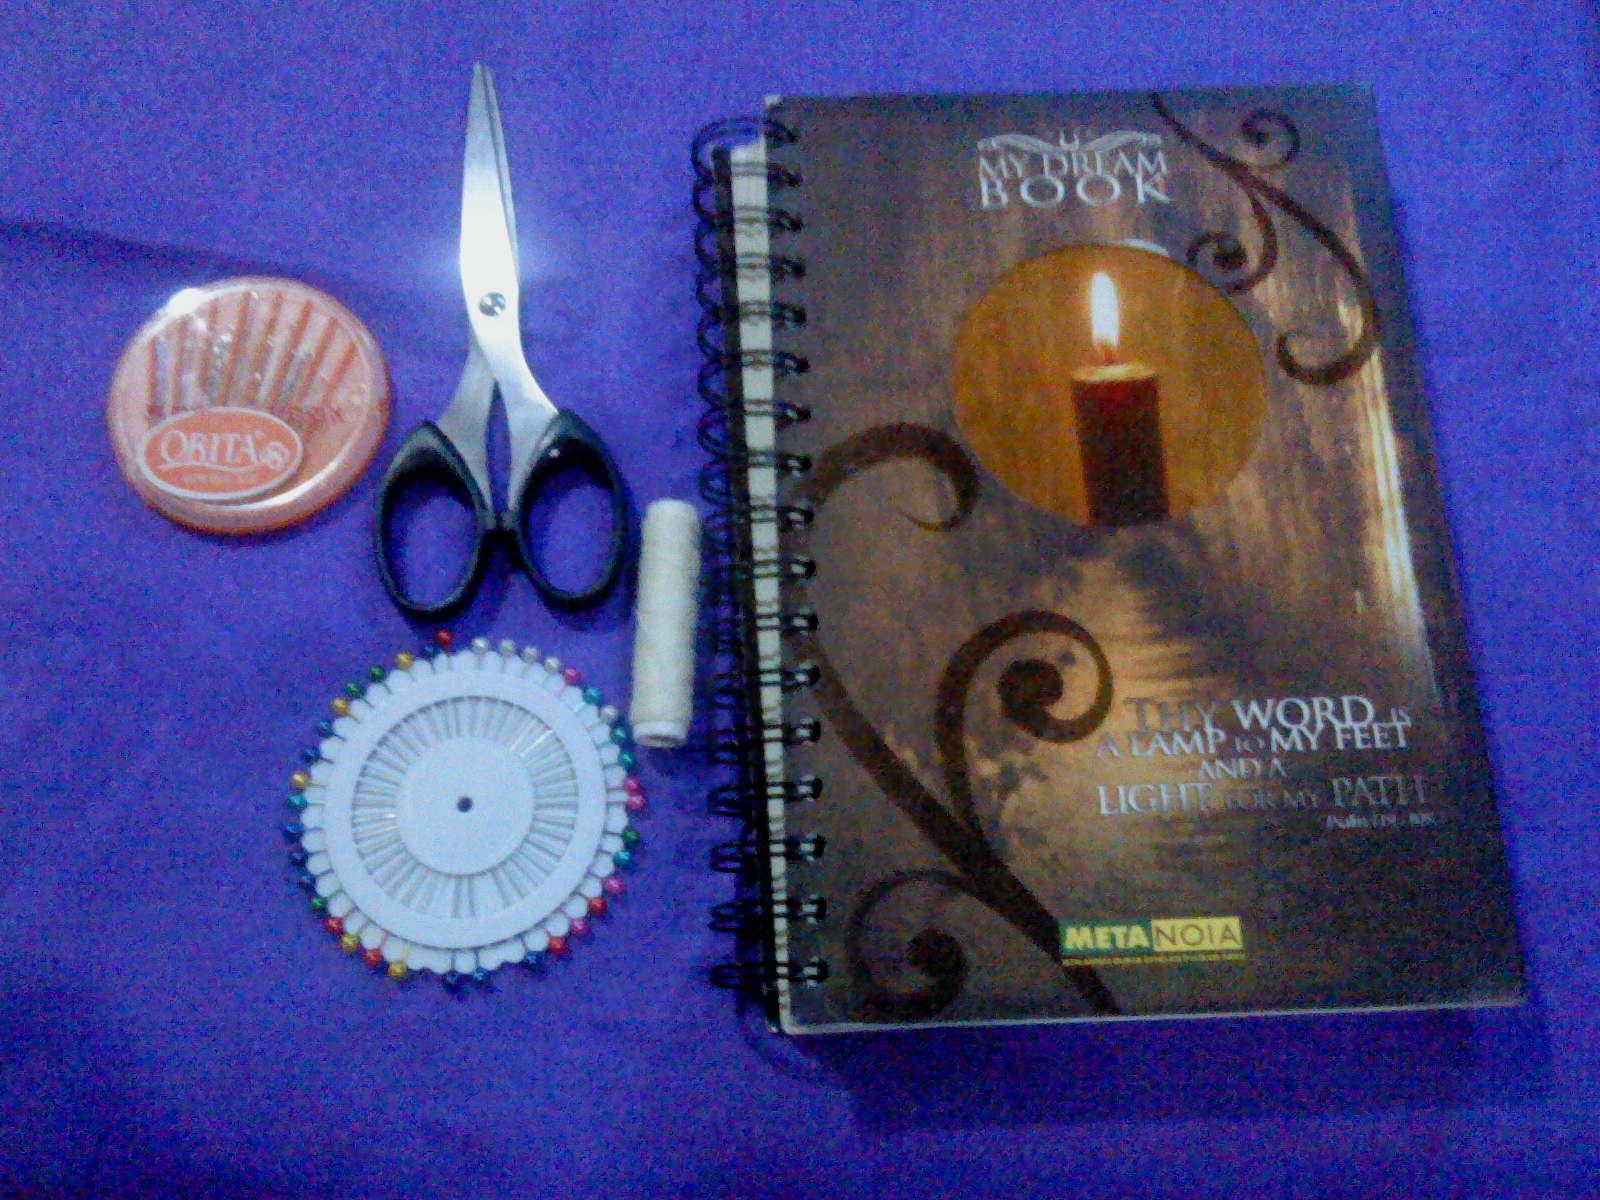 siapin bahan dan perlenkapan jarum benang jarum pentul gunting buku